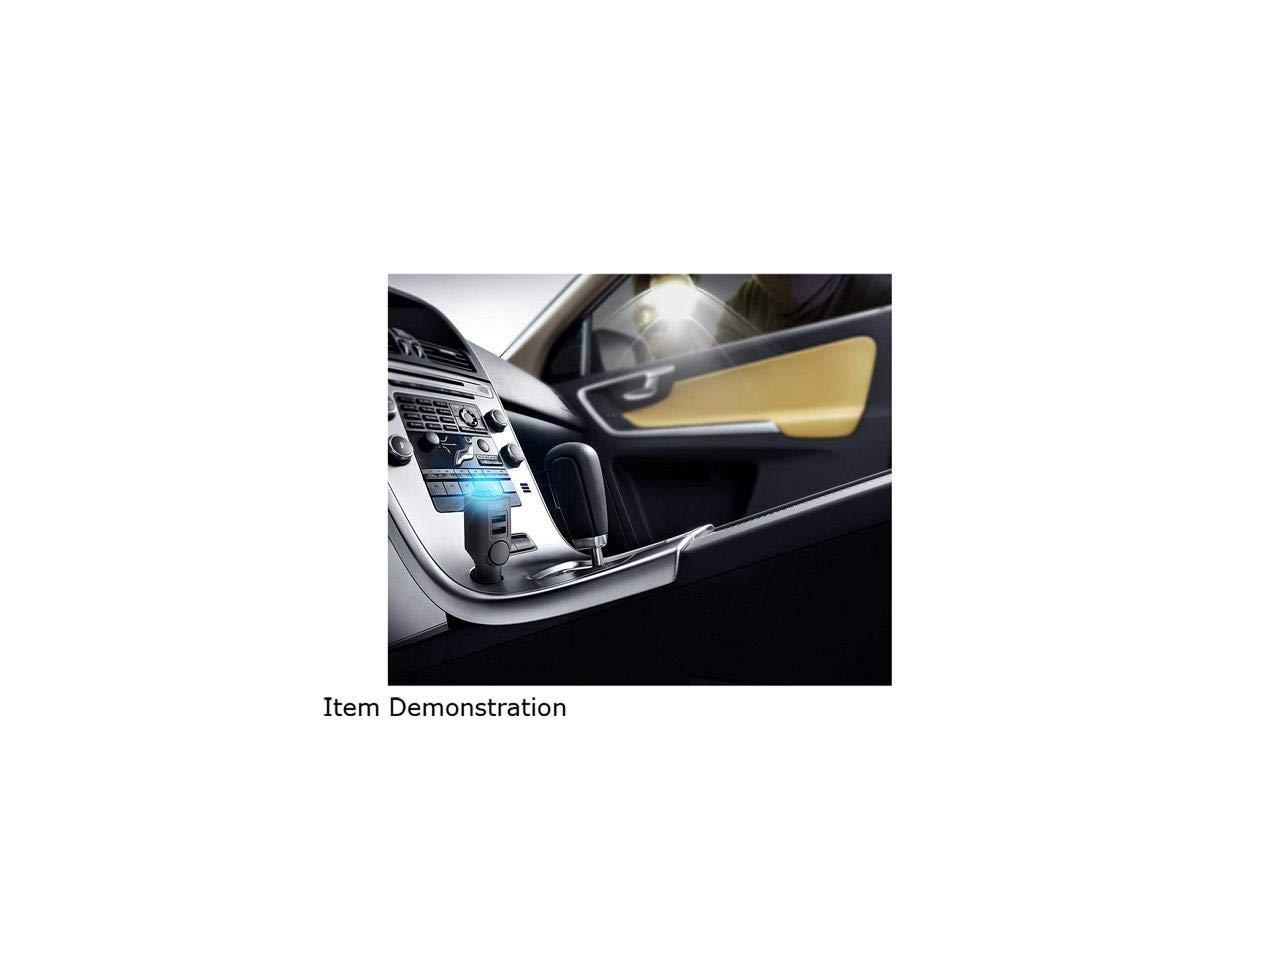 Motion Sensor Technaxx Car Keyless Alarm with Charging Function TX-100-26.25 ft